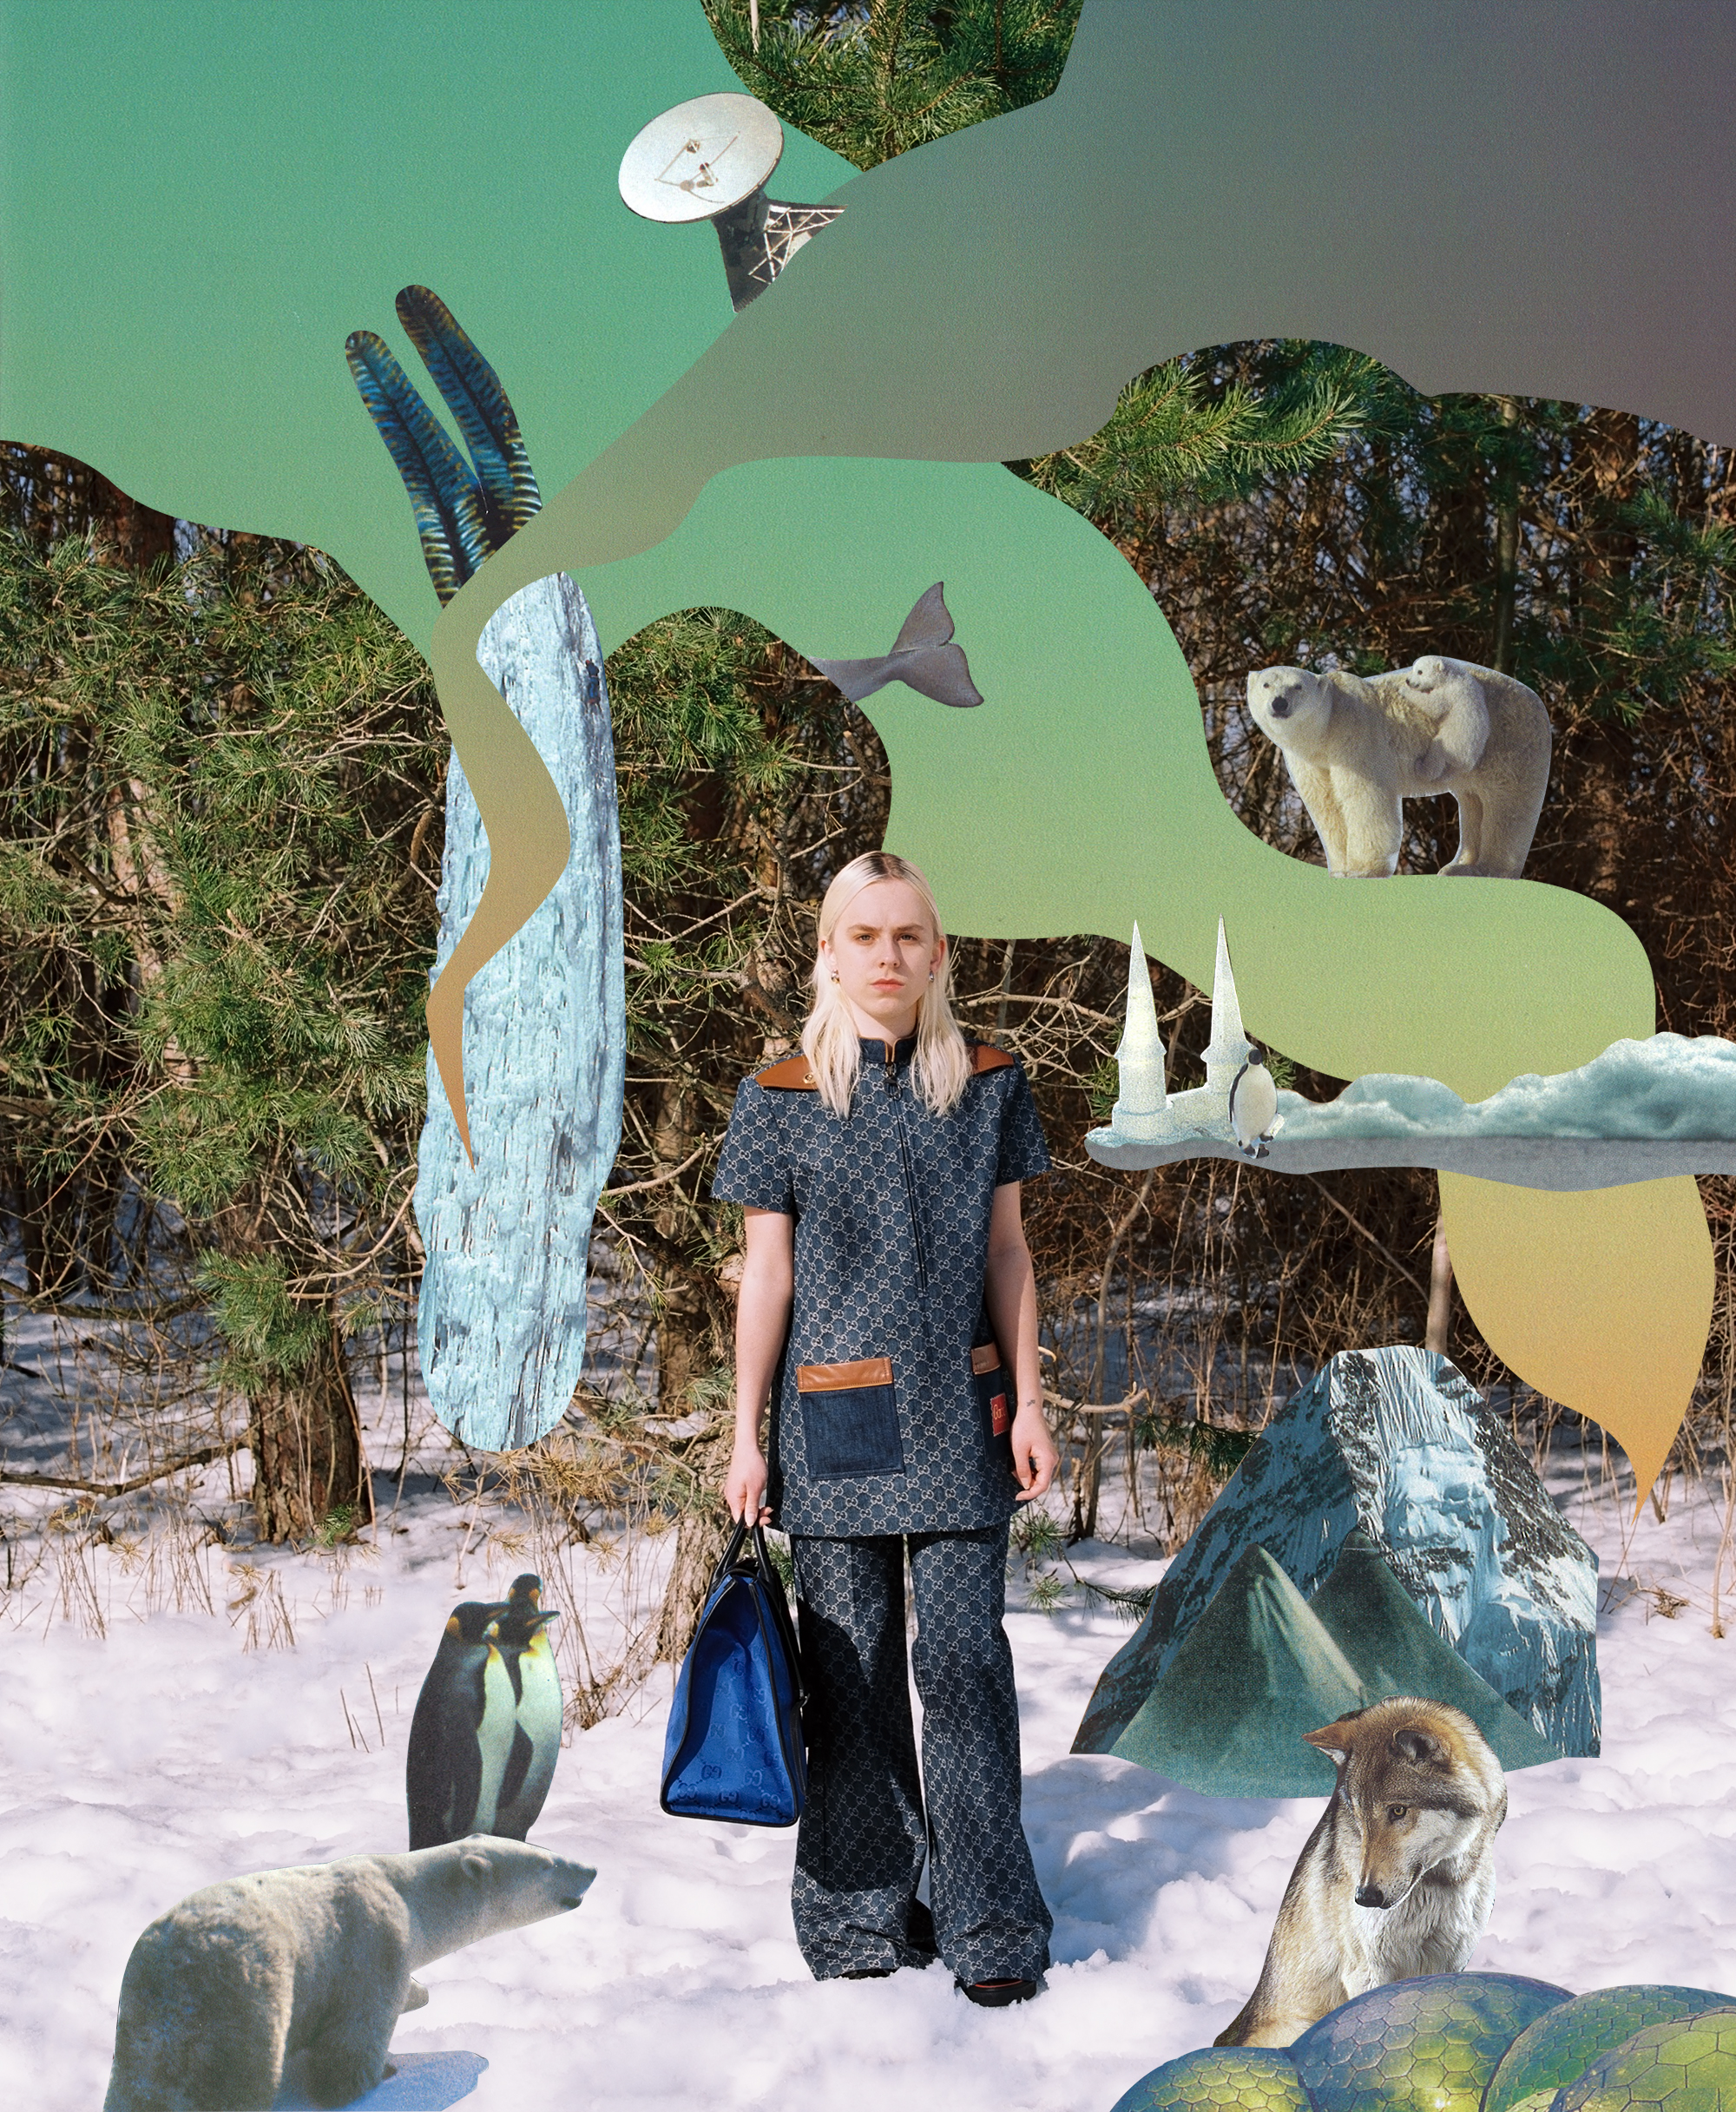 Gucci Imagined Futures Elise Image Courtesy of Farfetch 1